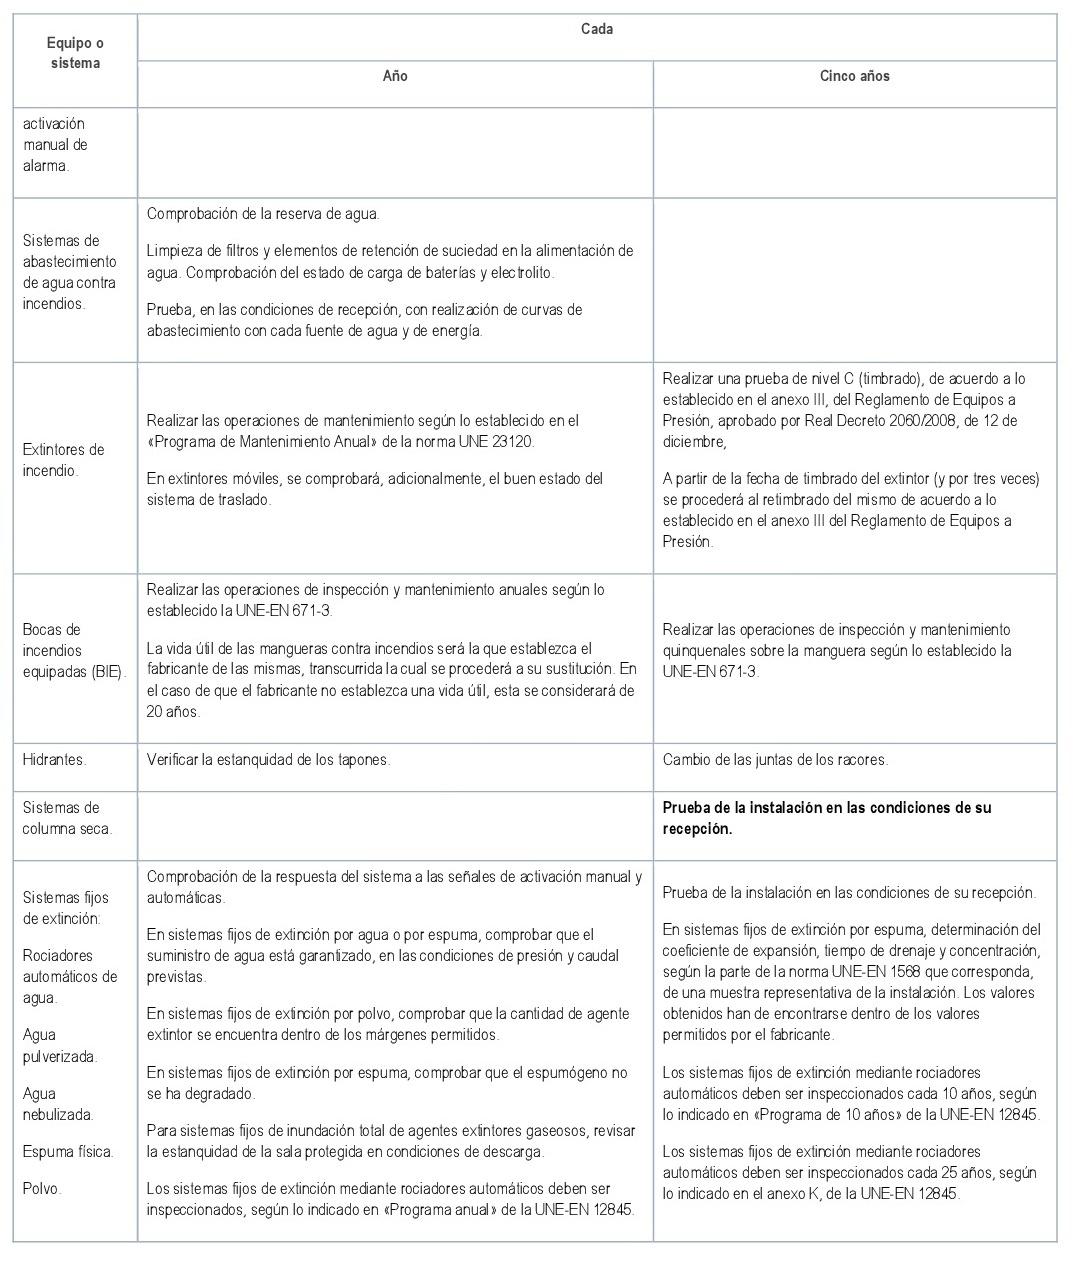 Tabla 5 RICPI